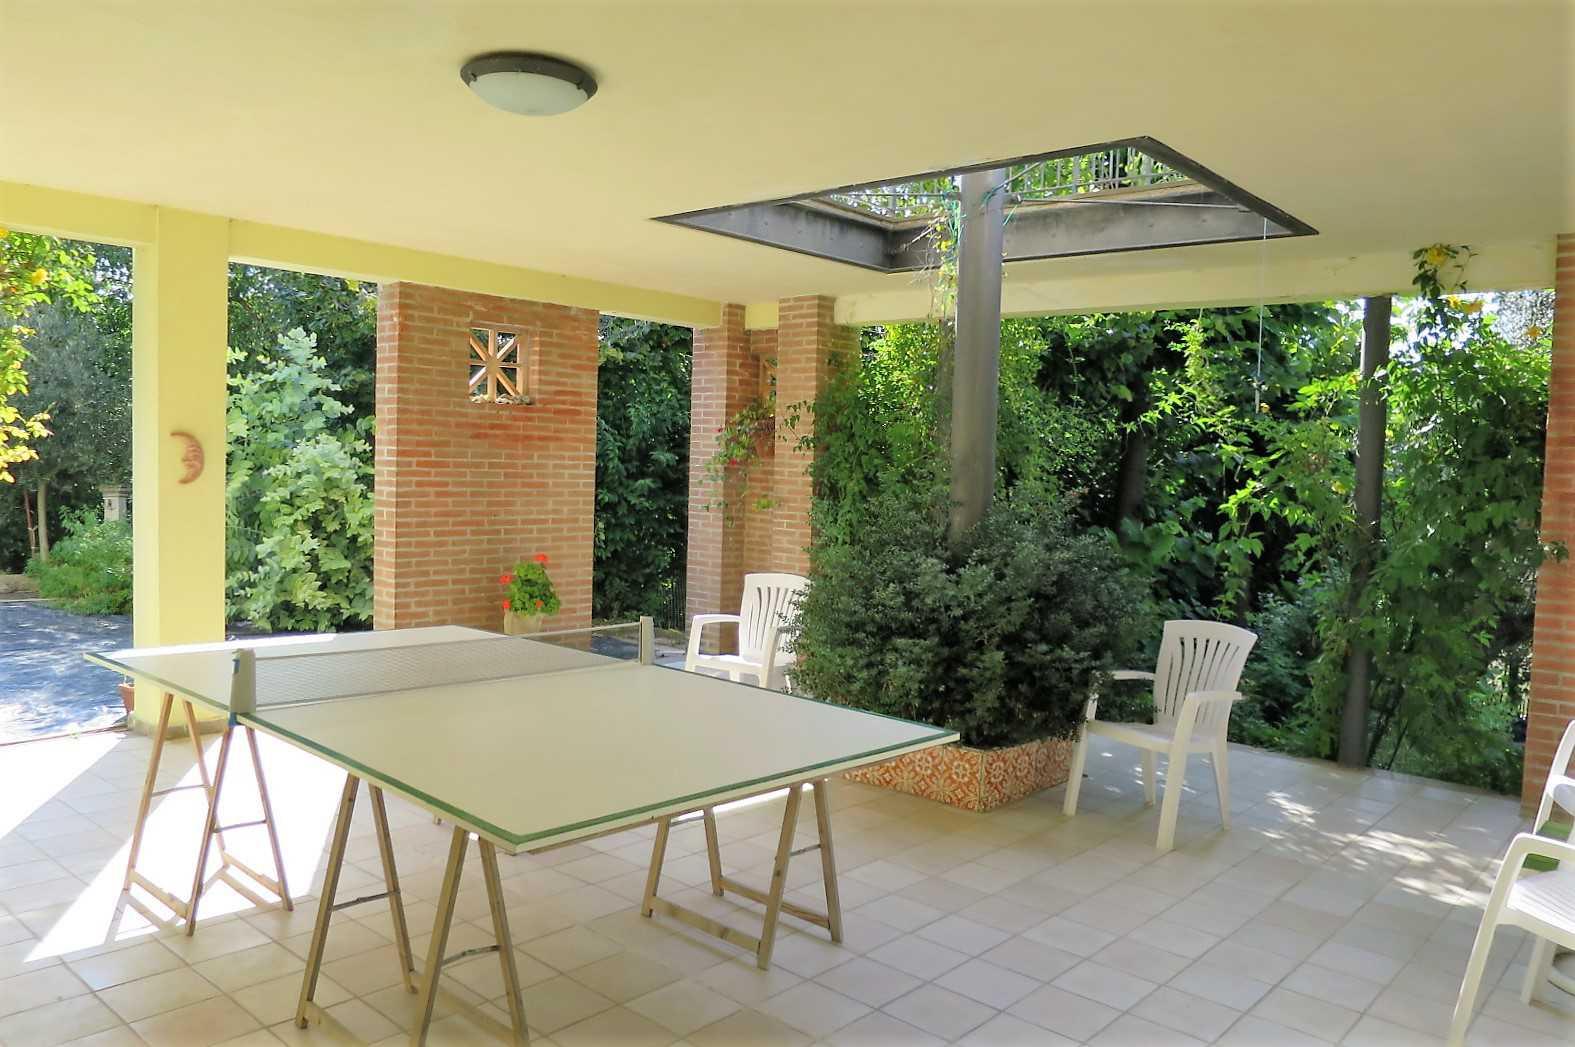 Villa Villa in vendita Atri (TE), Villa Paola - Atri - EUR 471.071 140